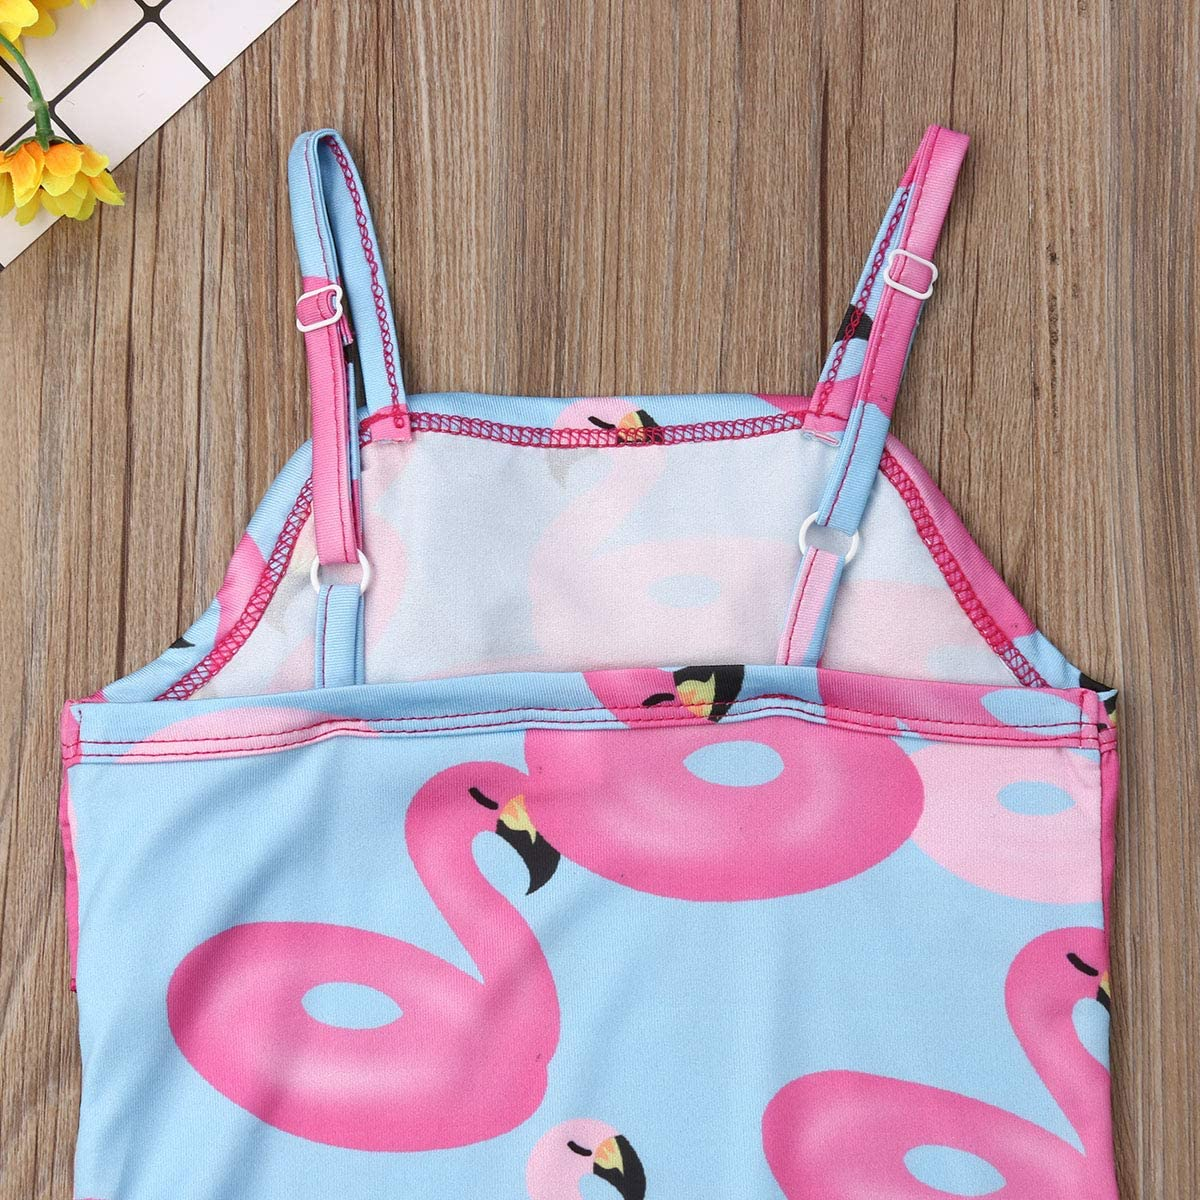 hirigin Toddler Baby Girl Strppy Ruffle Flounce Print One Piece Monokini Swimsuit